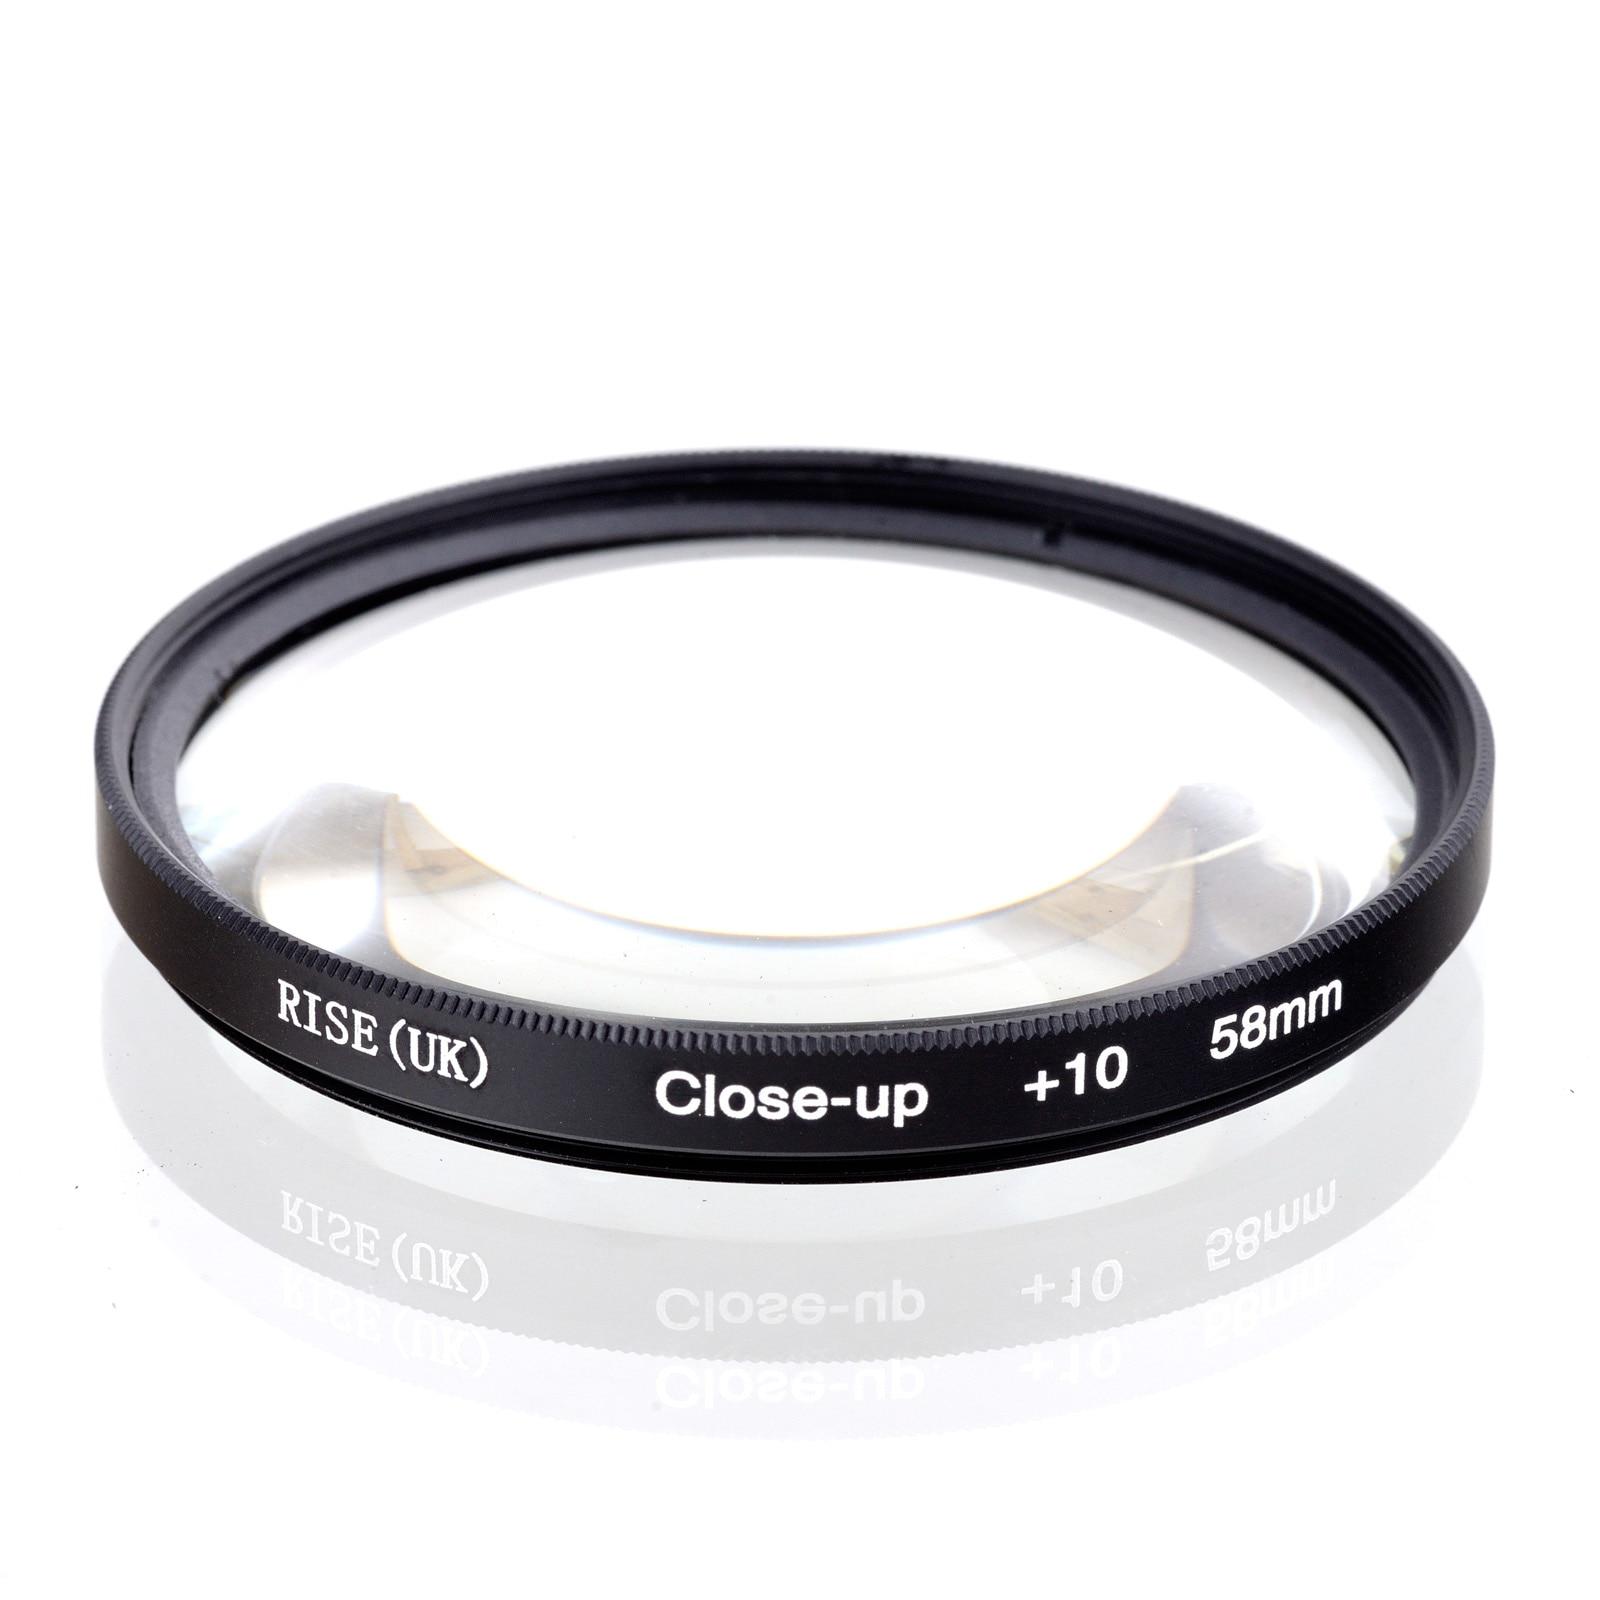 RISE(UK) 58mm Macro Close-Up +10 Close Up Filter For All DSLR Digital Cameras 58MM LENS